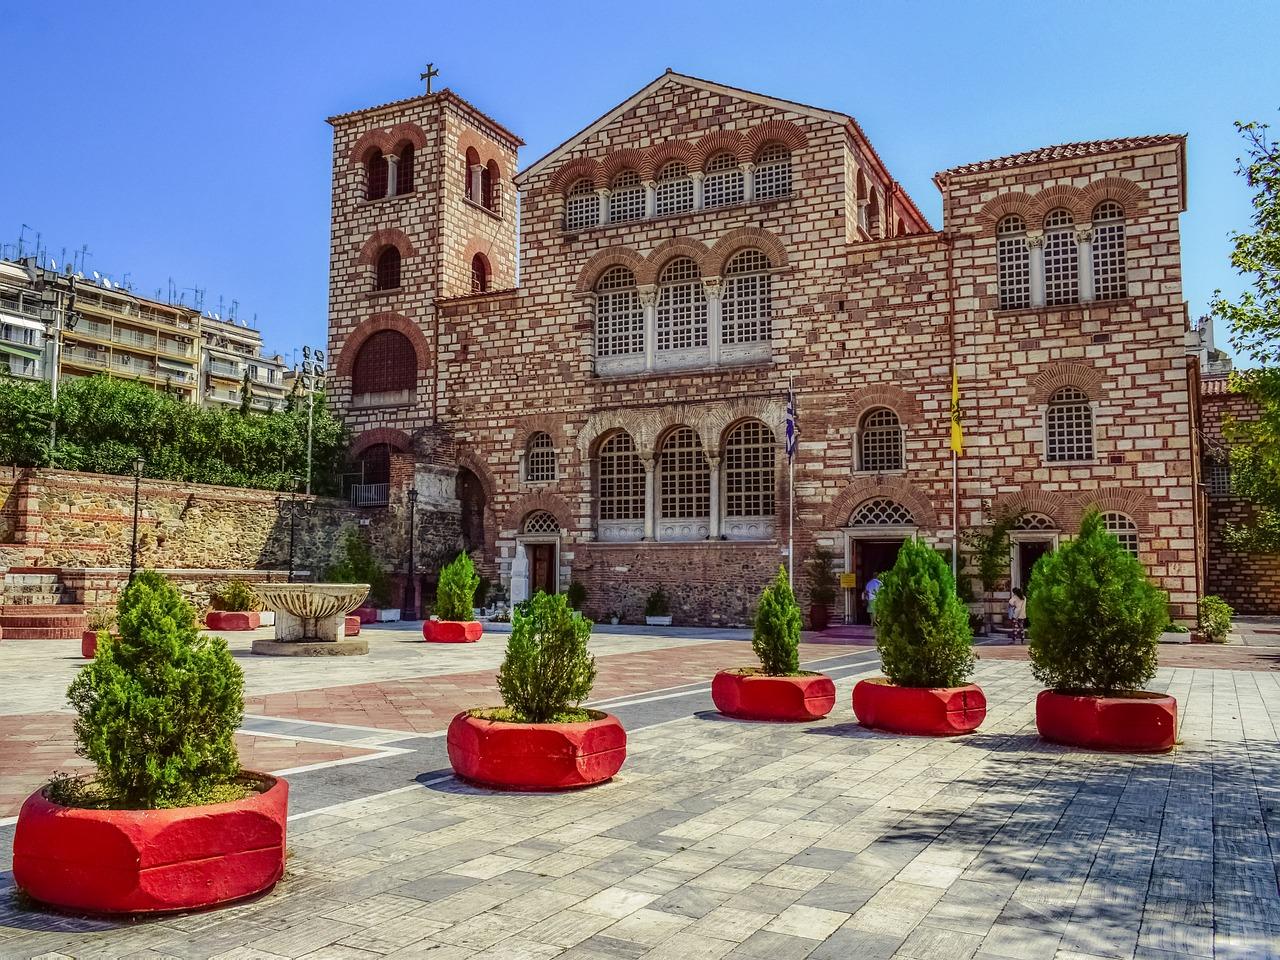 Biserica Sfântul Dimitrie